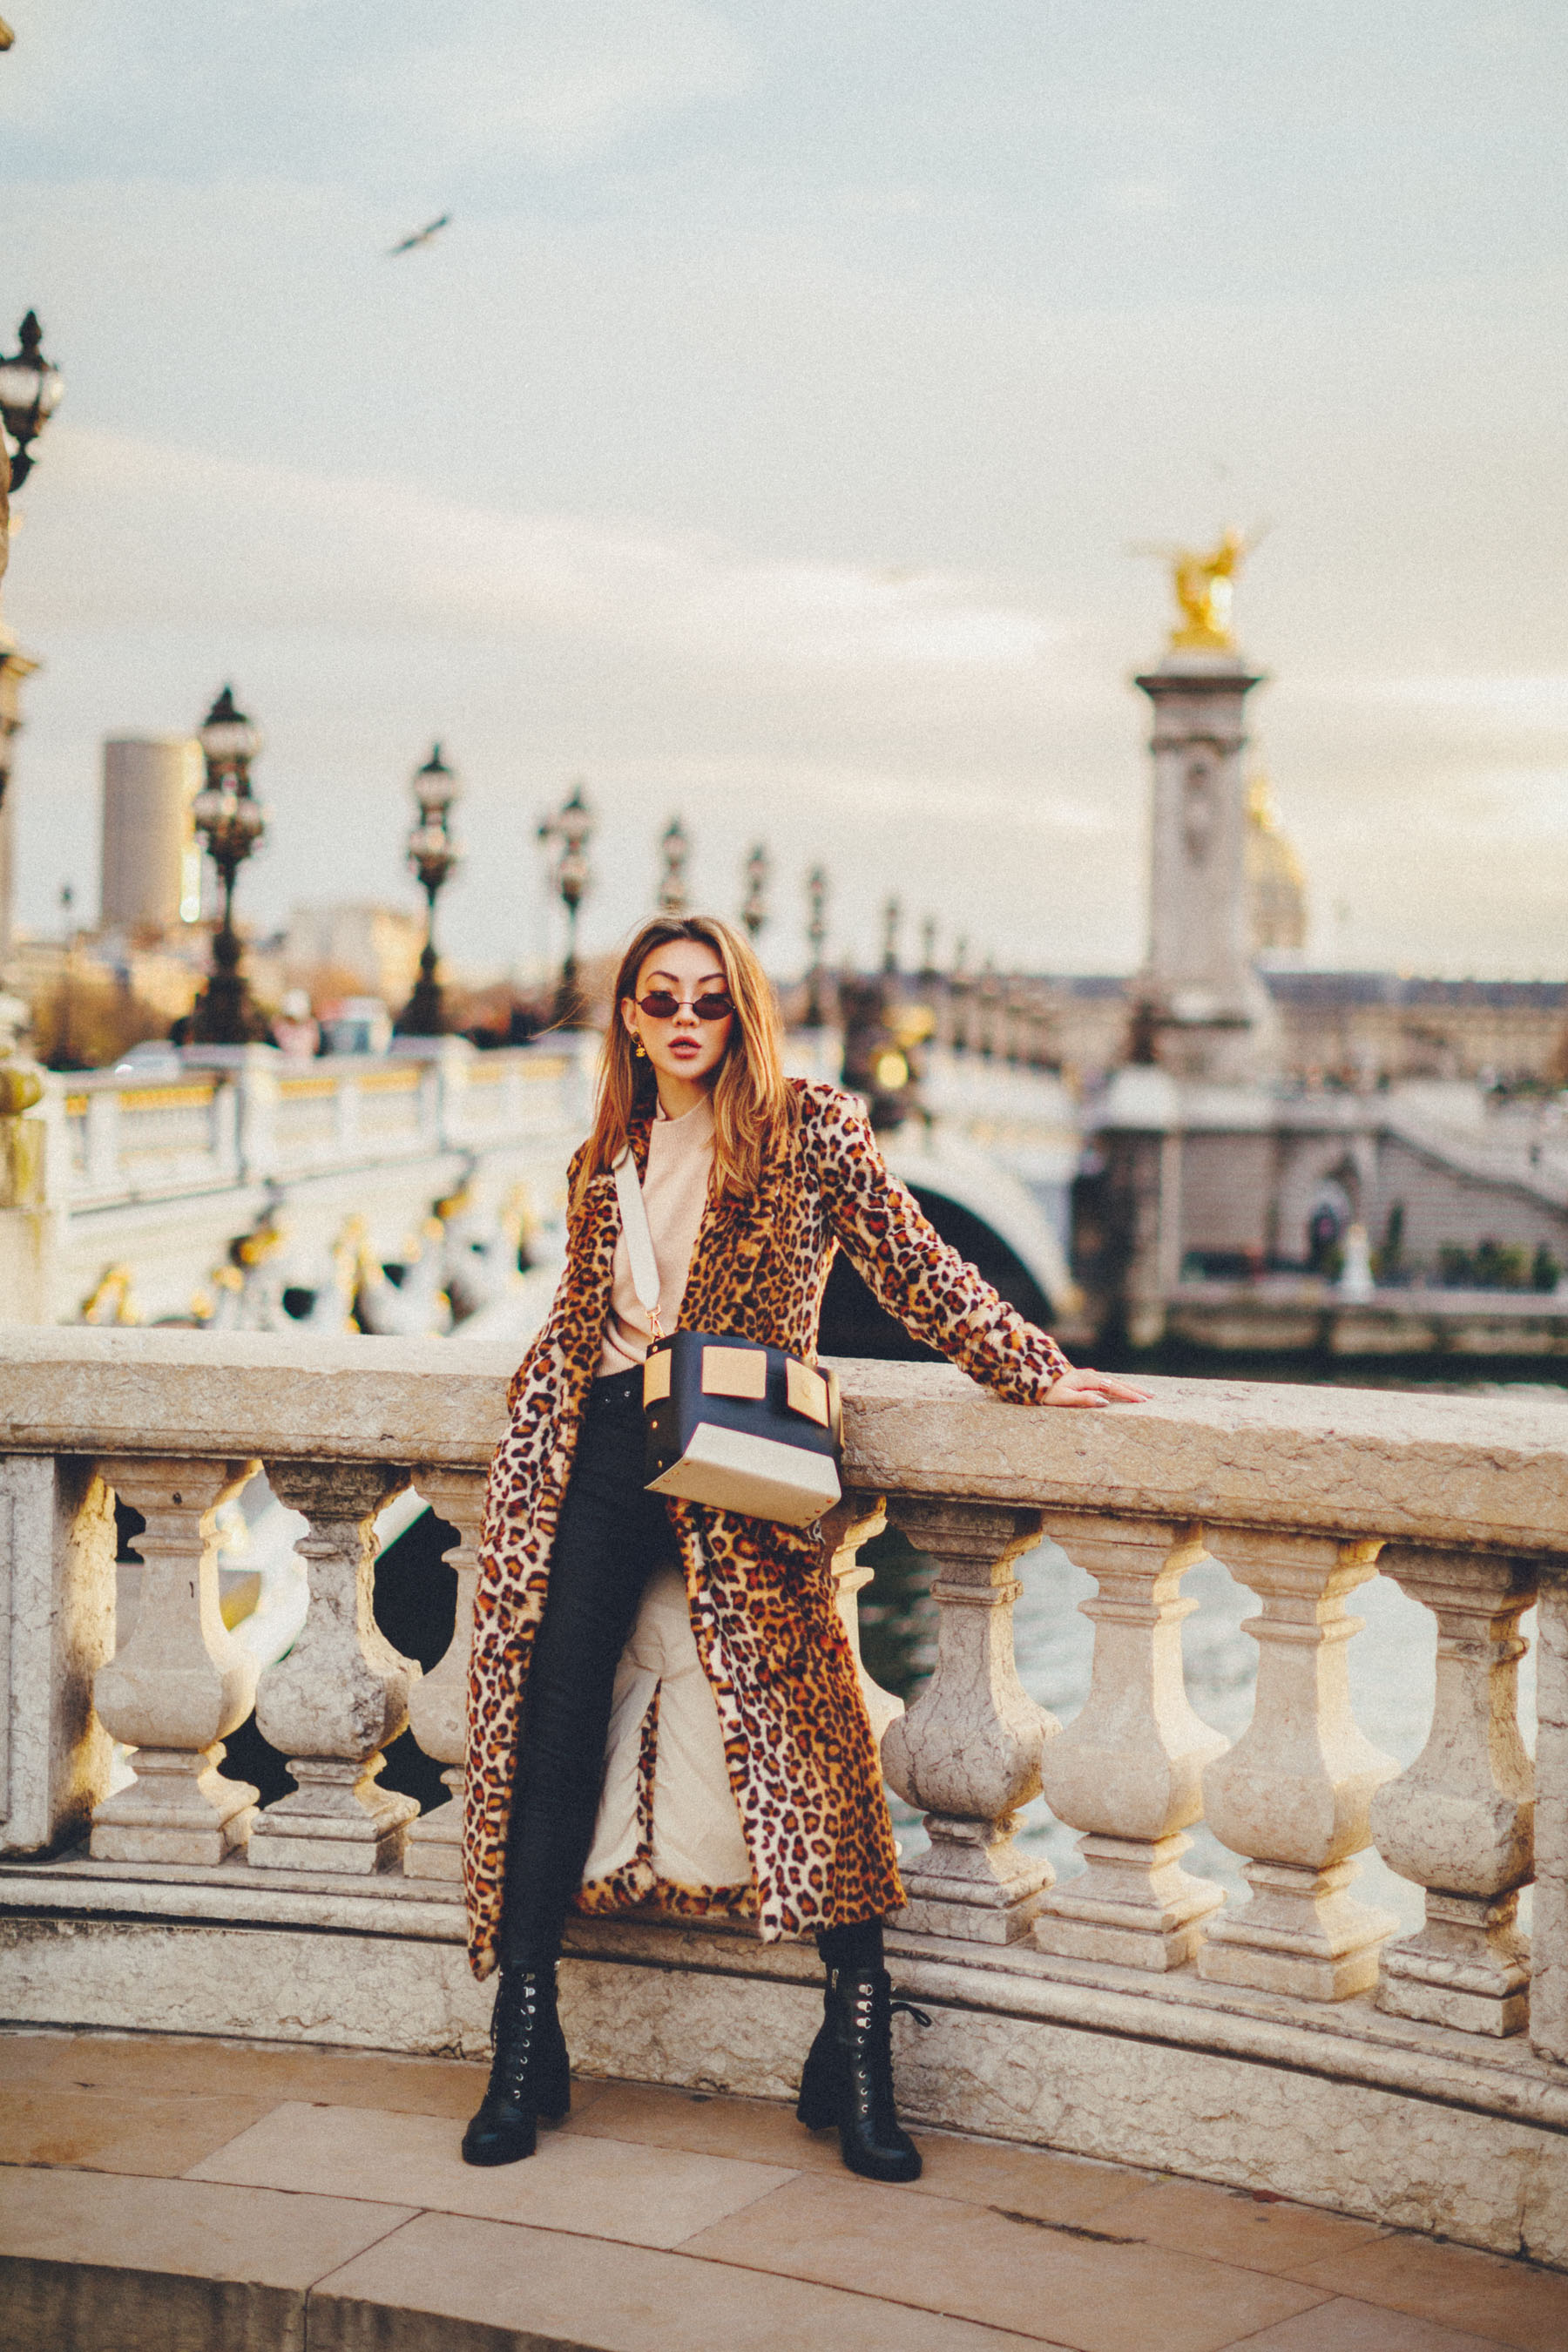 best fall 2019 boots, combat boots outfit, pont alexandre iii bridge, leopard coat, yuzefi bag // Notjessfashion.com